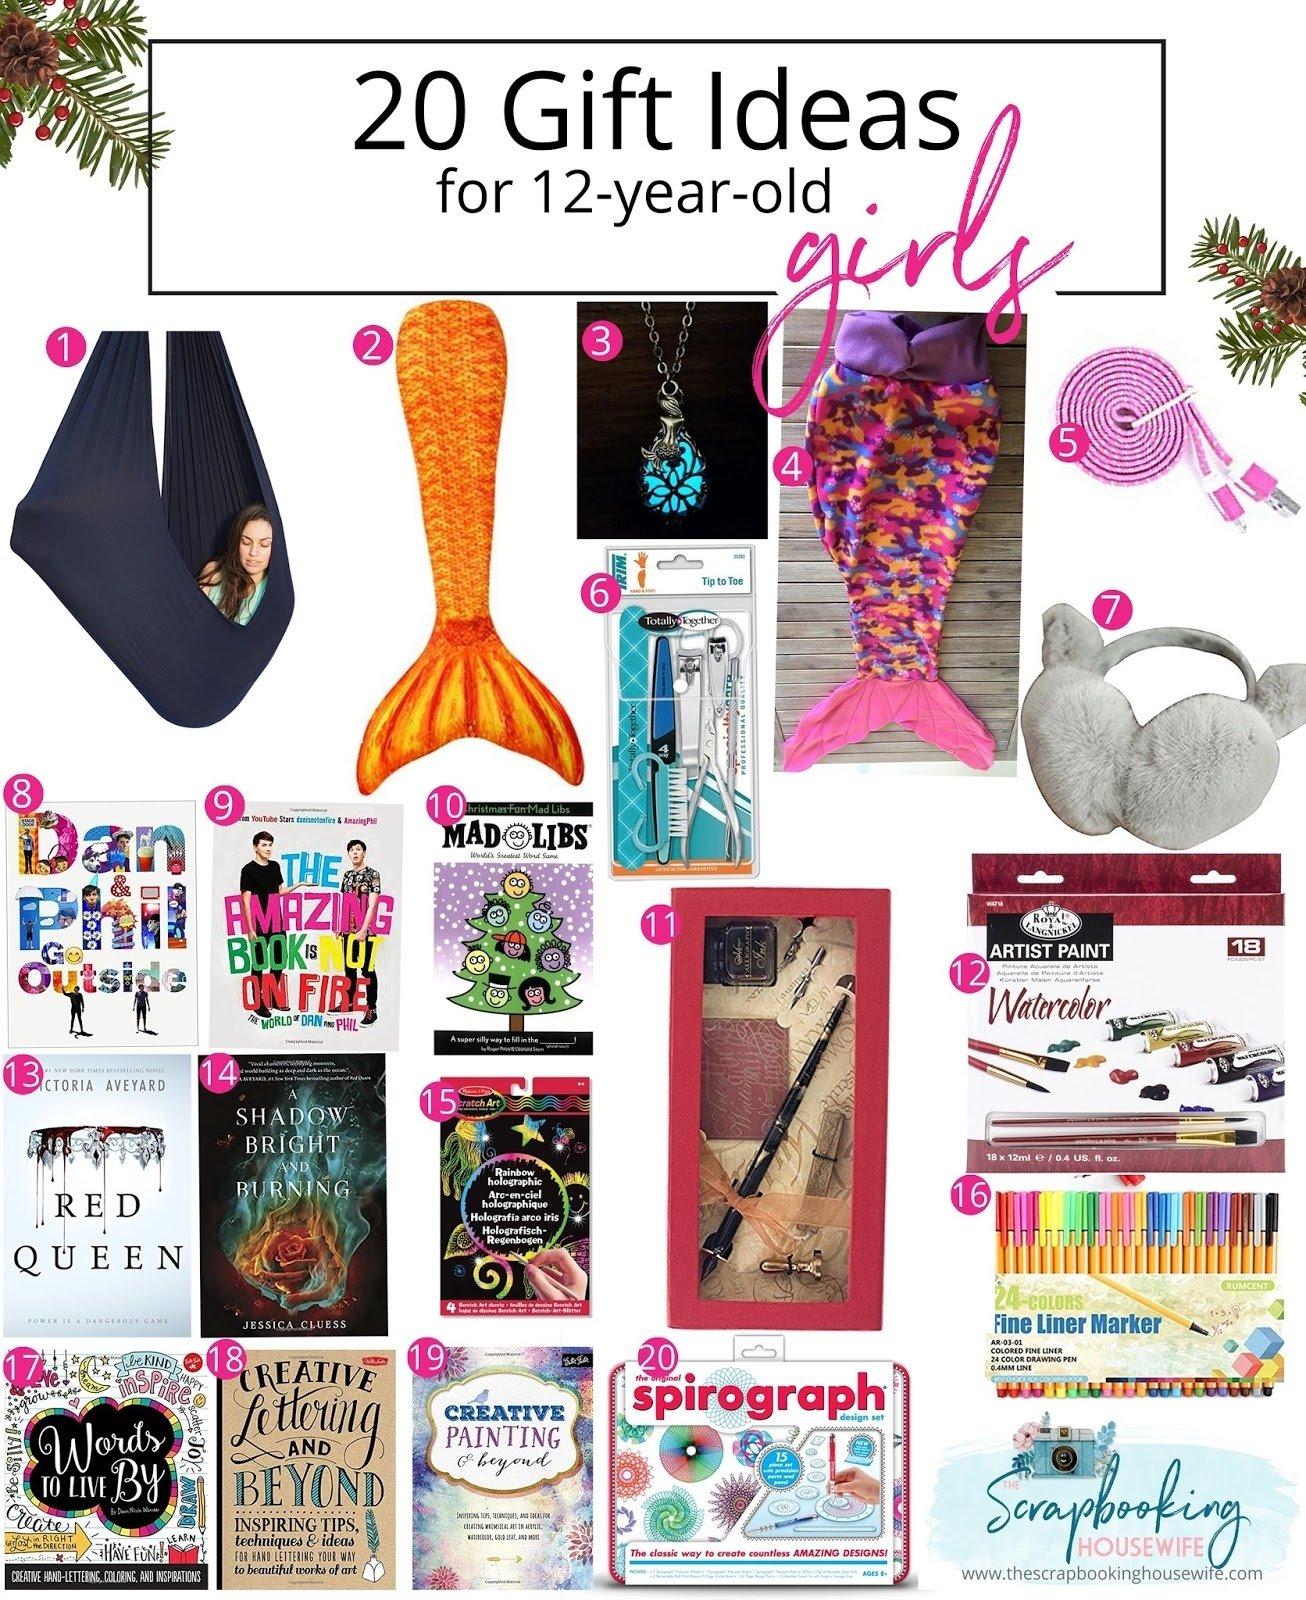 ellabella designs: 20 gift ideas for 12-year-old tween girls